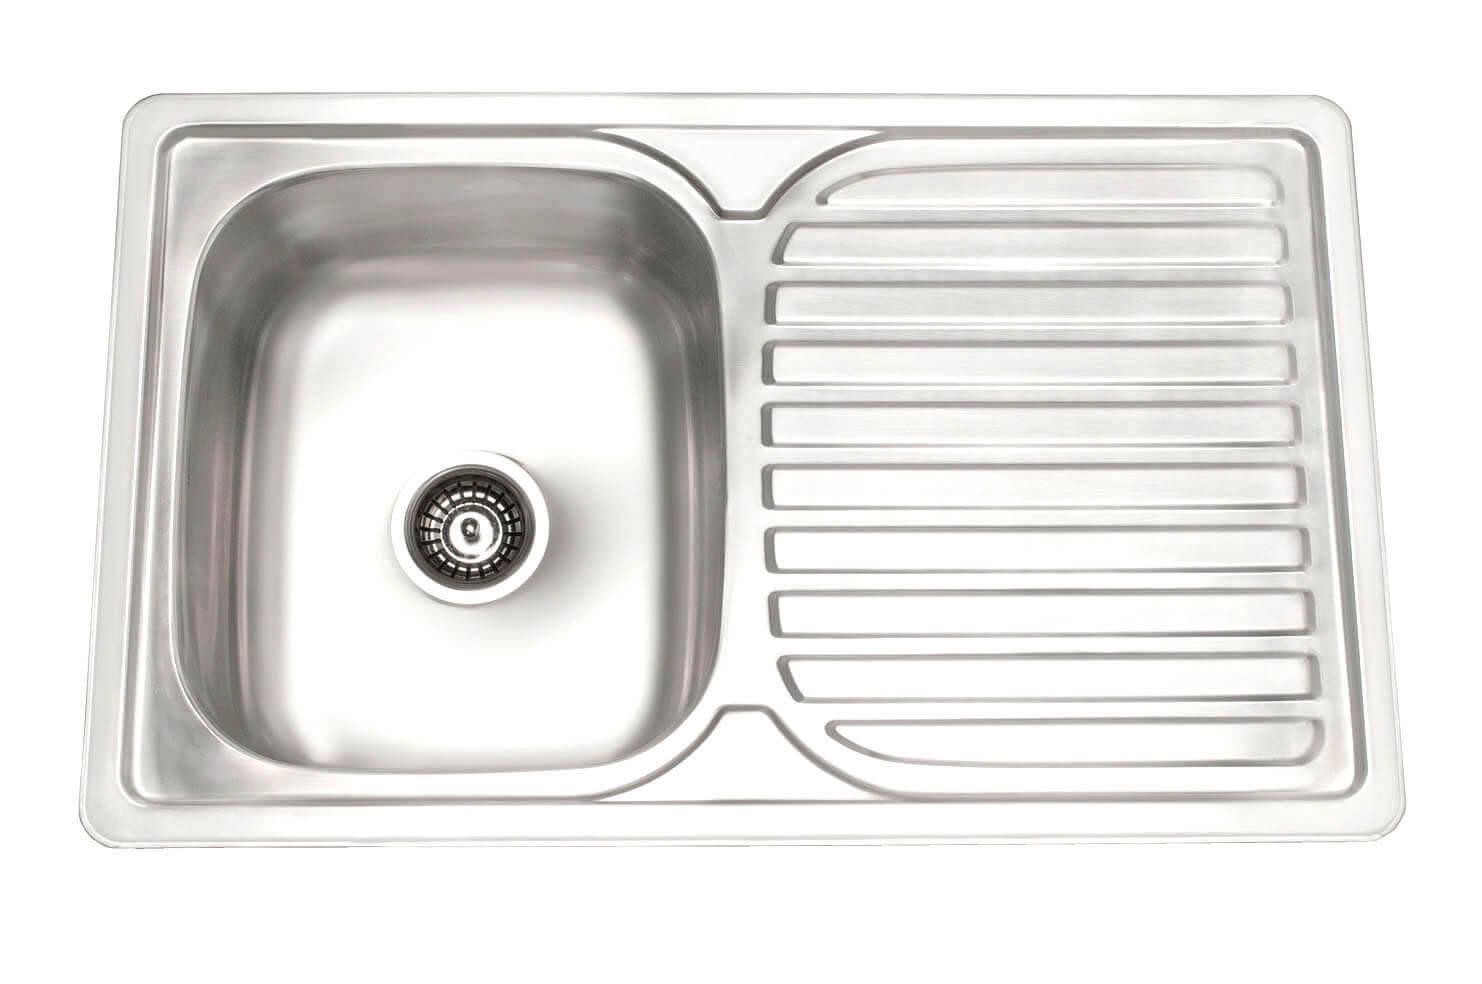 IK1347 Sapphire Sink Image